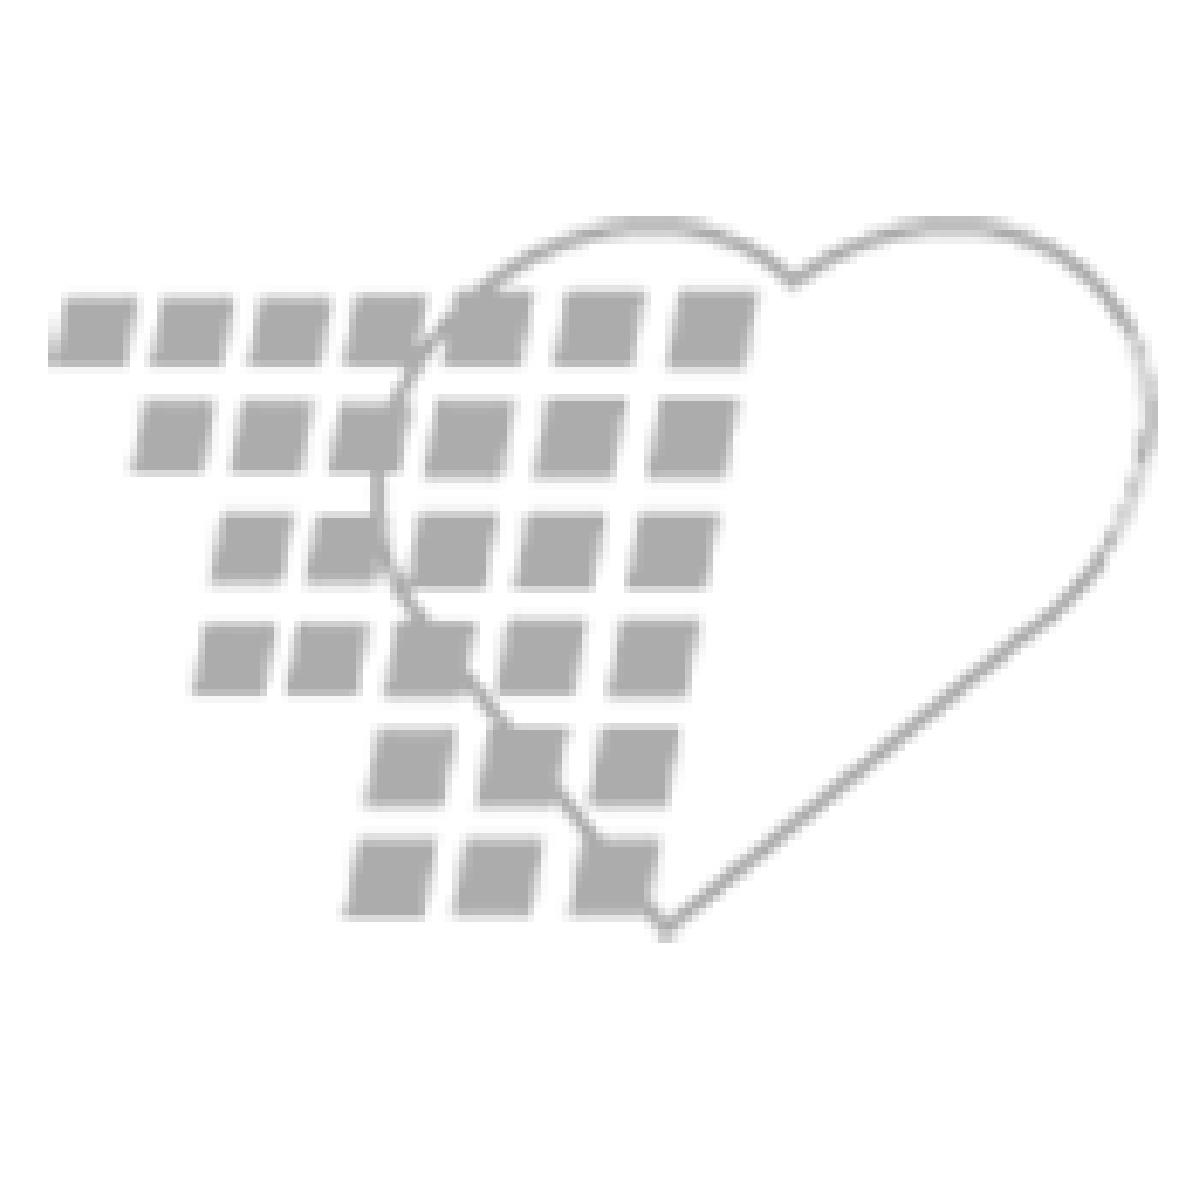 06-93-0081 - Demo Dose® Atarx 25 mg - 1000 Pills/Jar